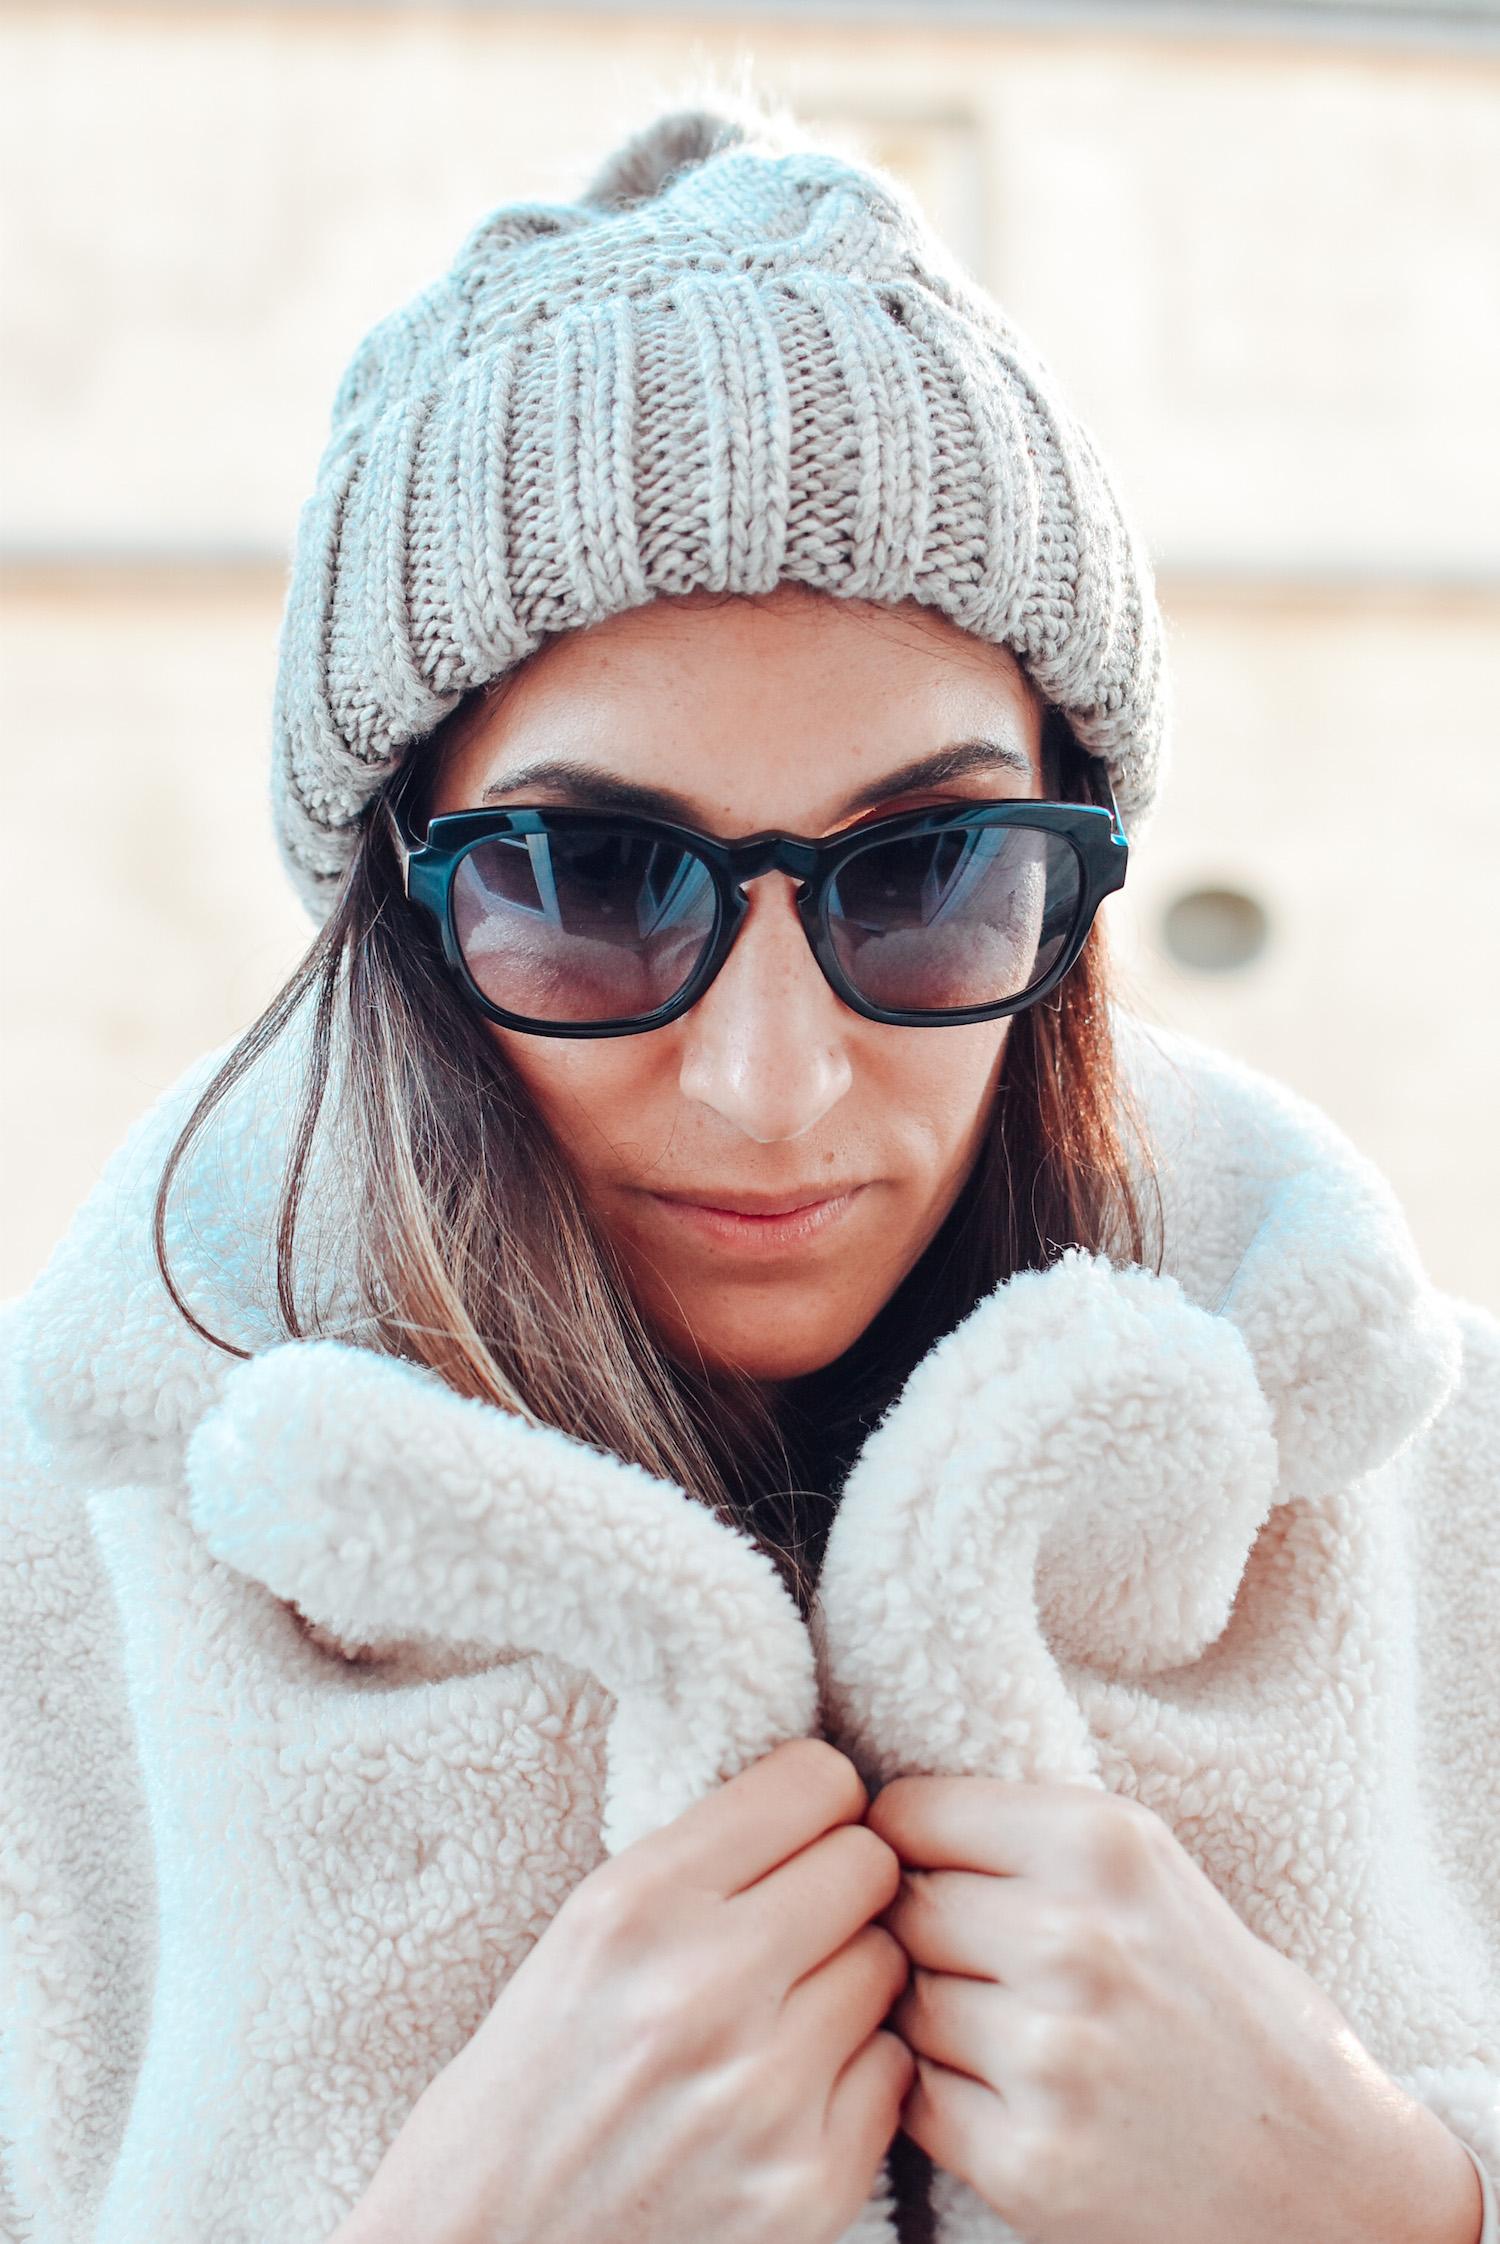 French artisan style: Meg Eyewear